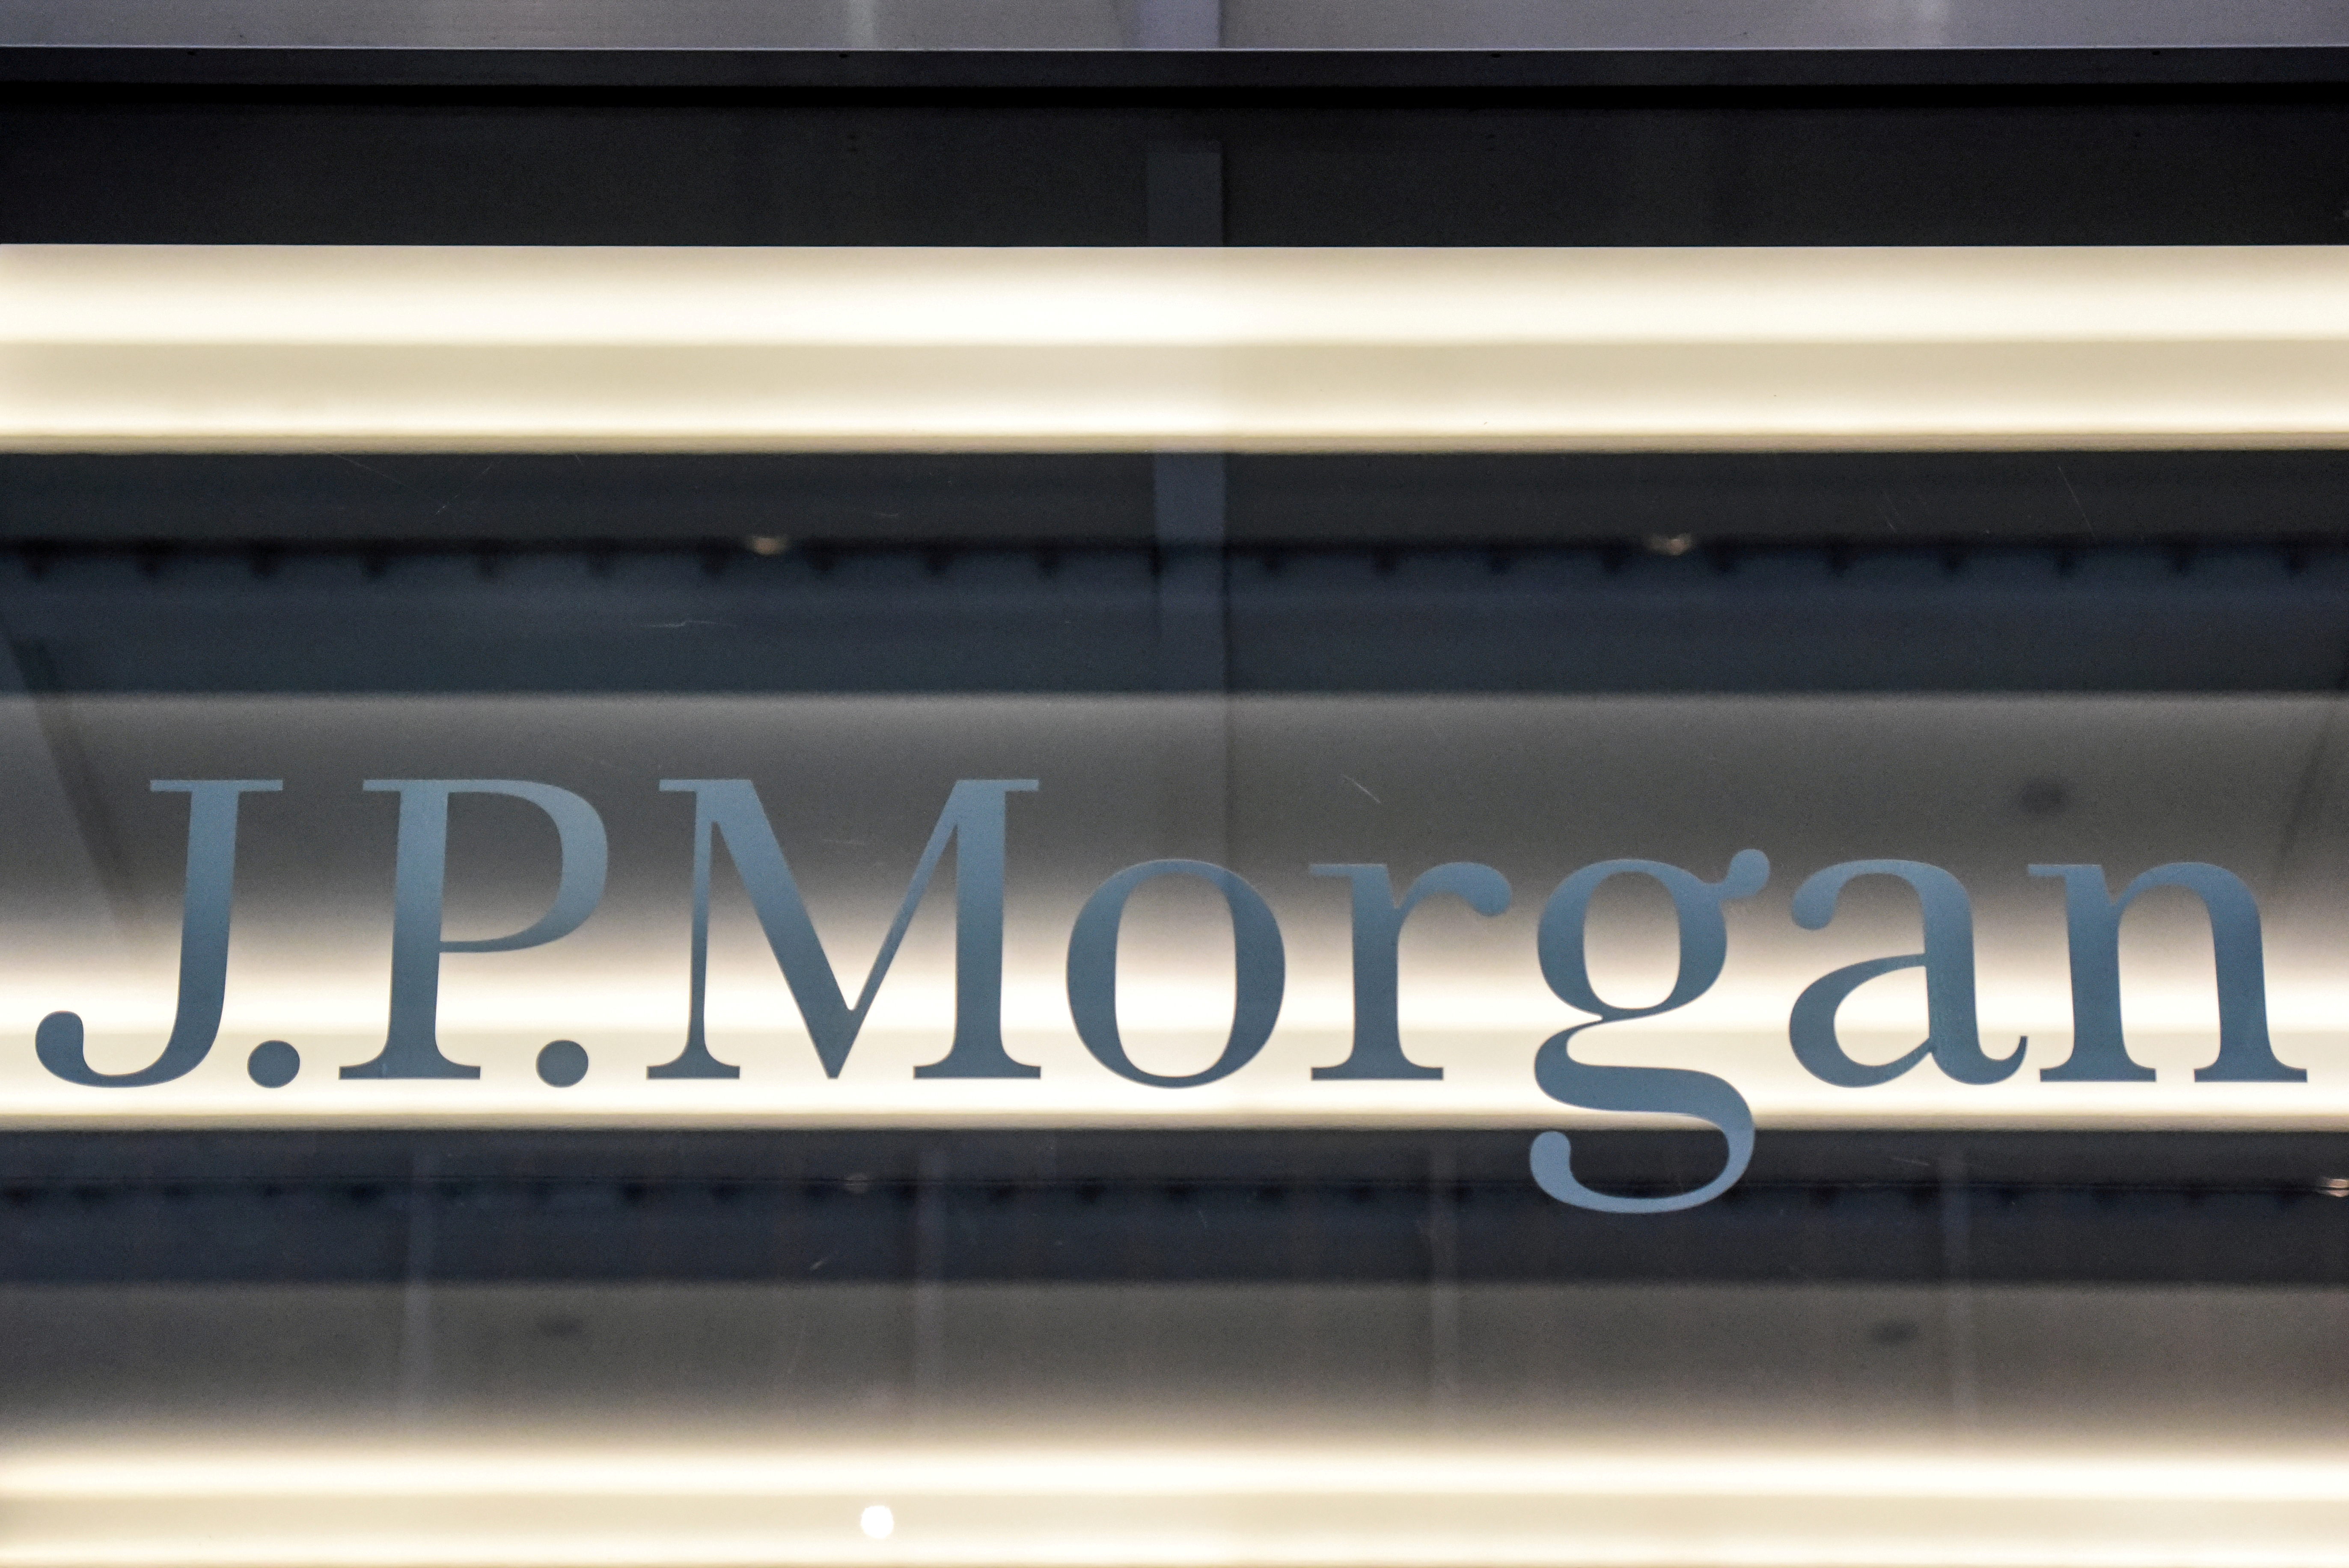 A J.P. Morgan logo is seen in New York City, U.S., January 10, 2017. REUTERS/Stephanie Keith